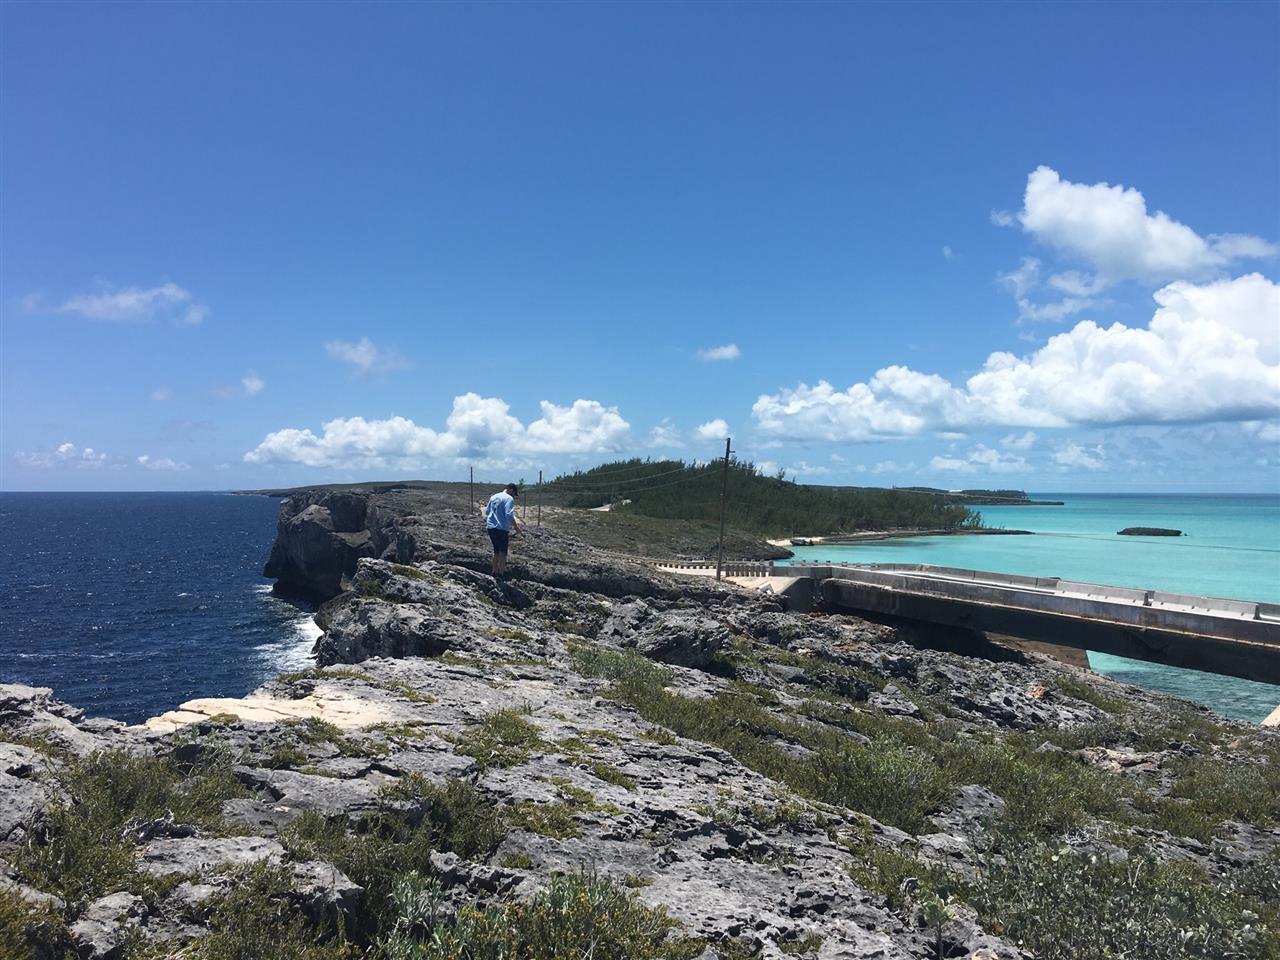 The Glass Window Bridge (where two oceans meet), Eleuthera, Bahamas